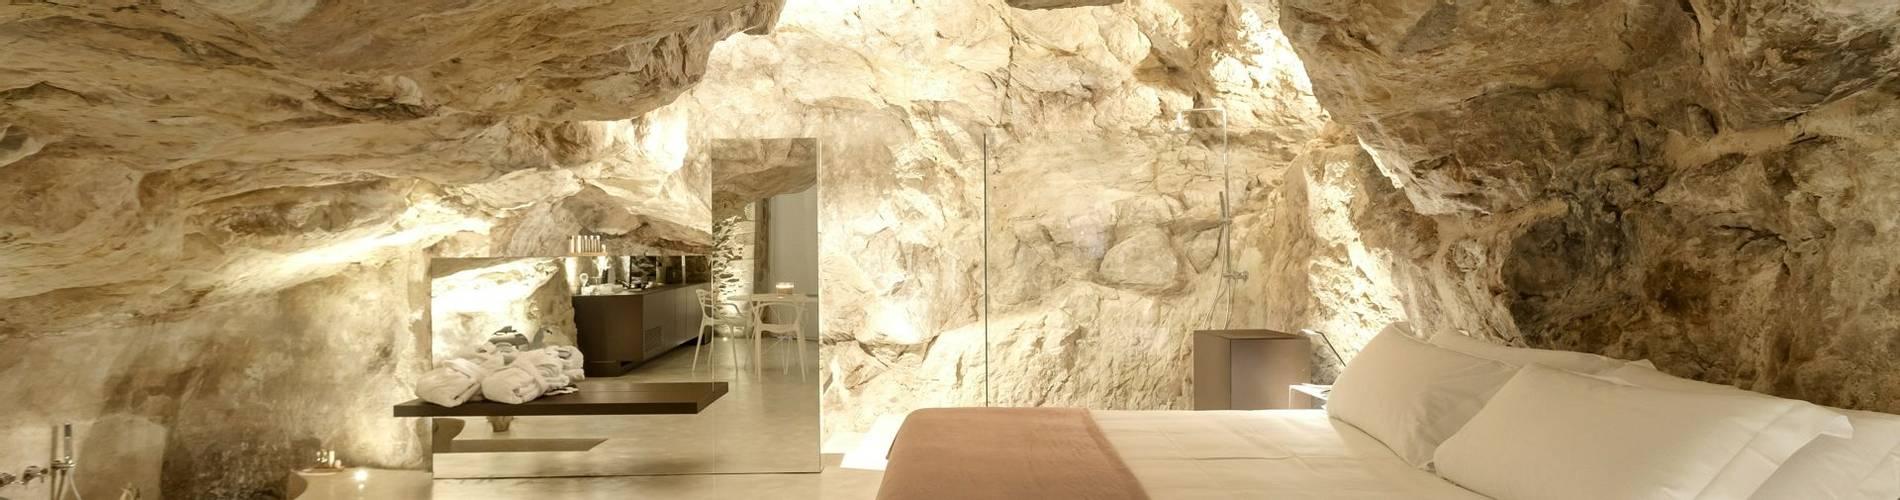 Locanda Don Serafino, Sicily, Italy, Luxury Suite (7).jpg